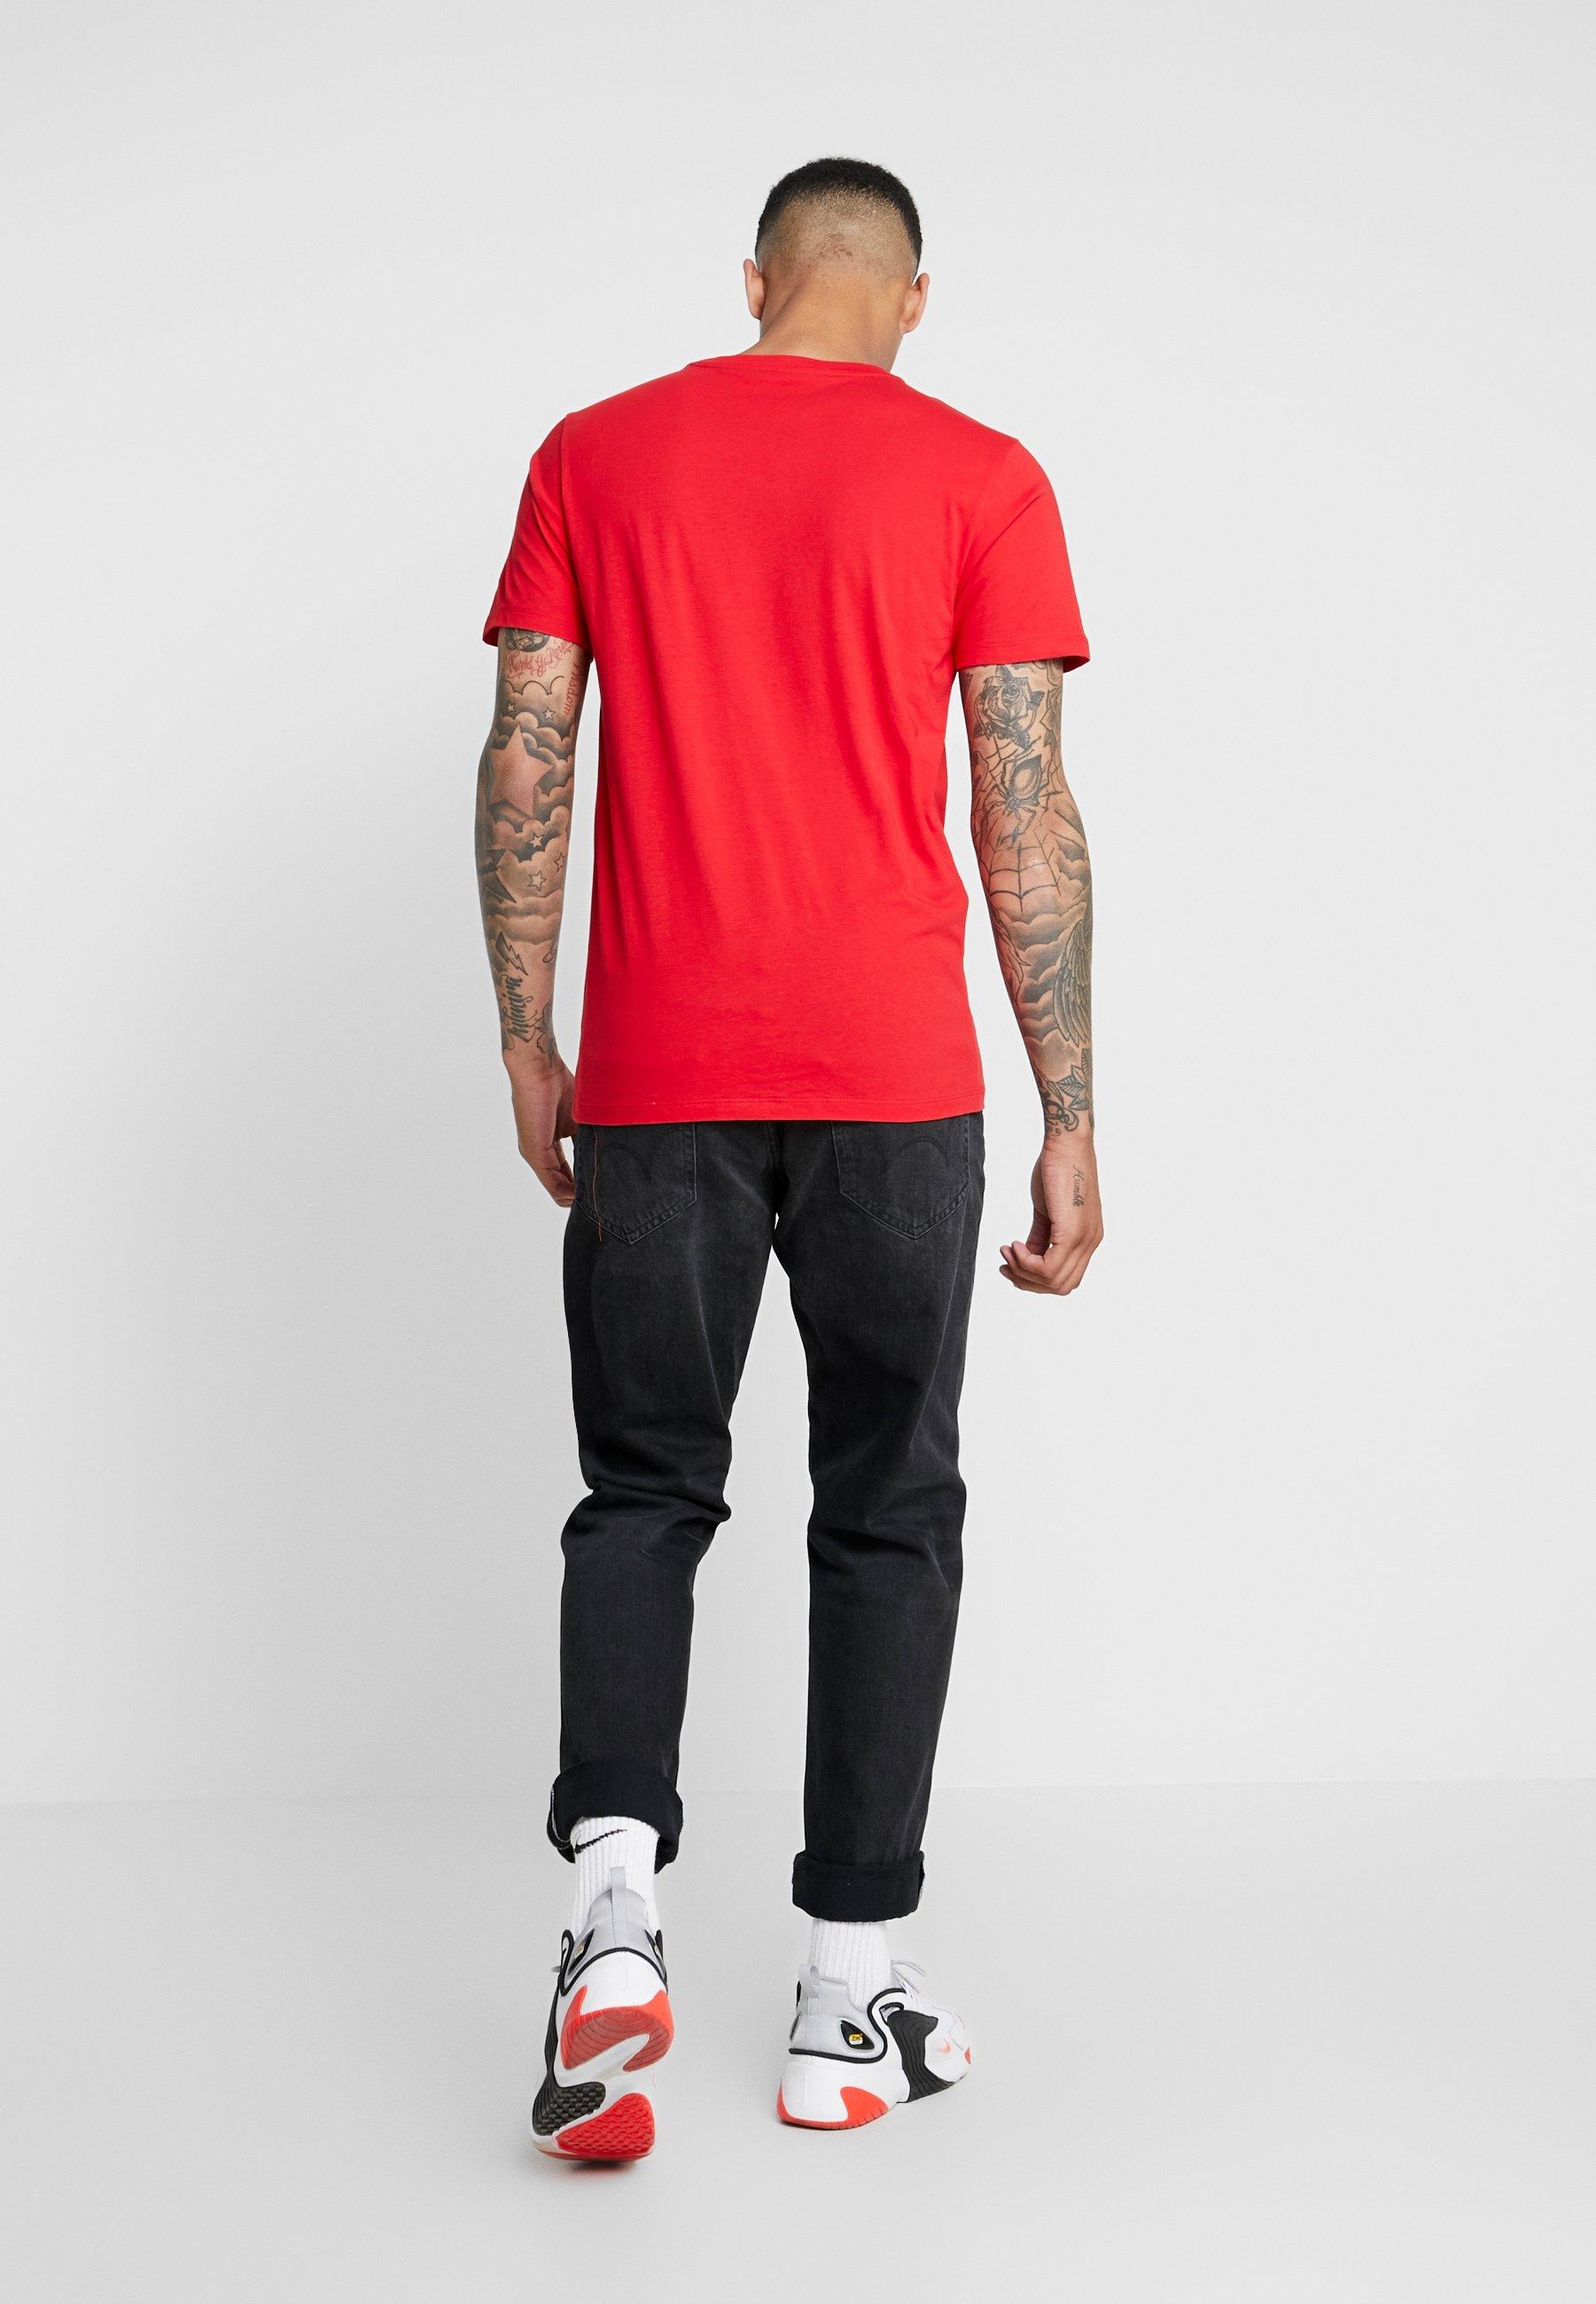 Lee Red Imprimé Logo TeeT shirt Warp EDYe9IbWH2